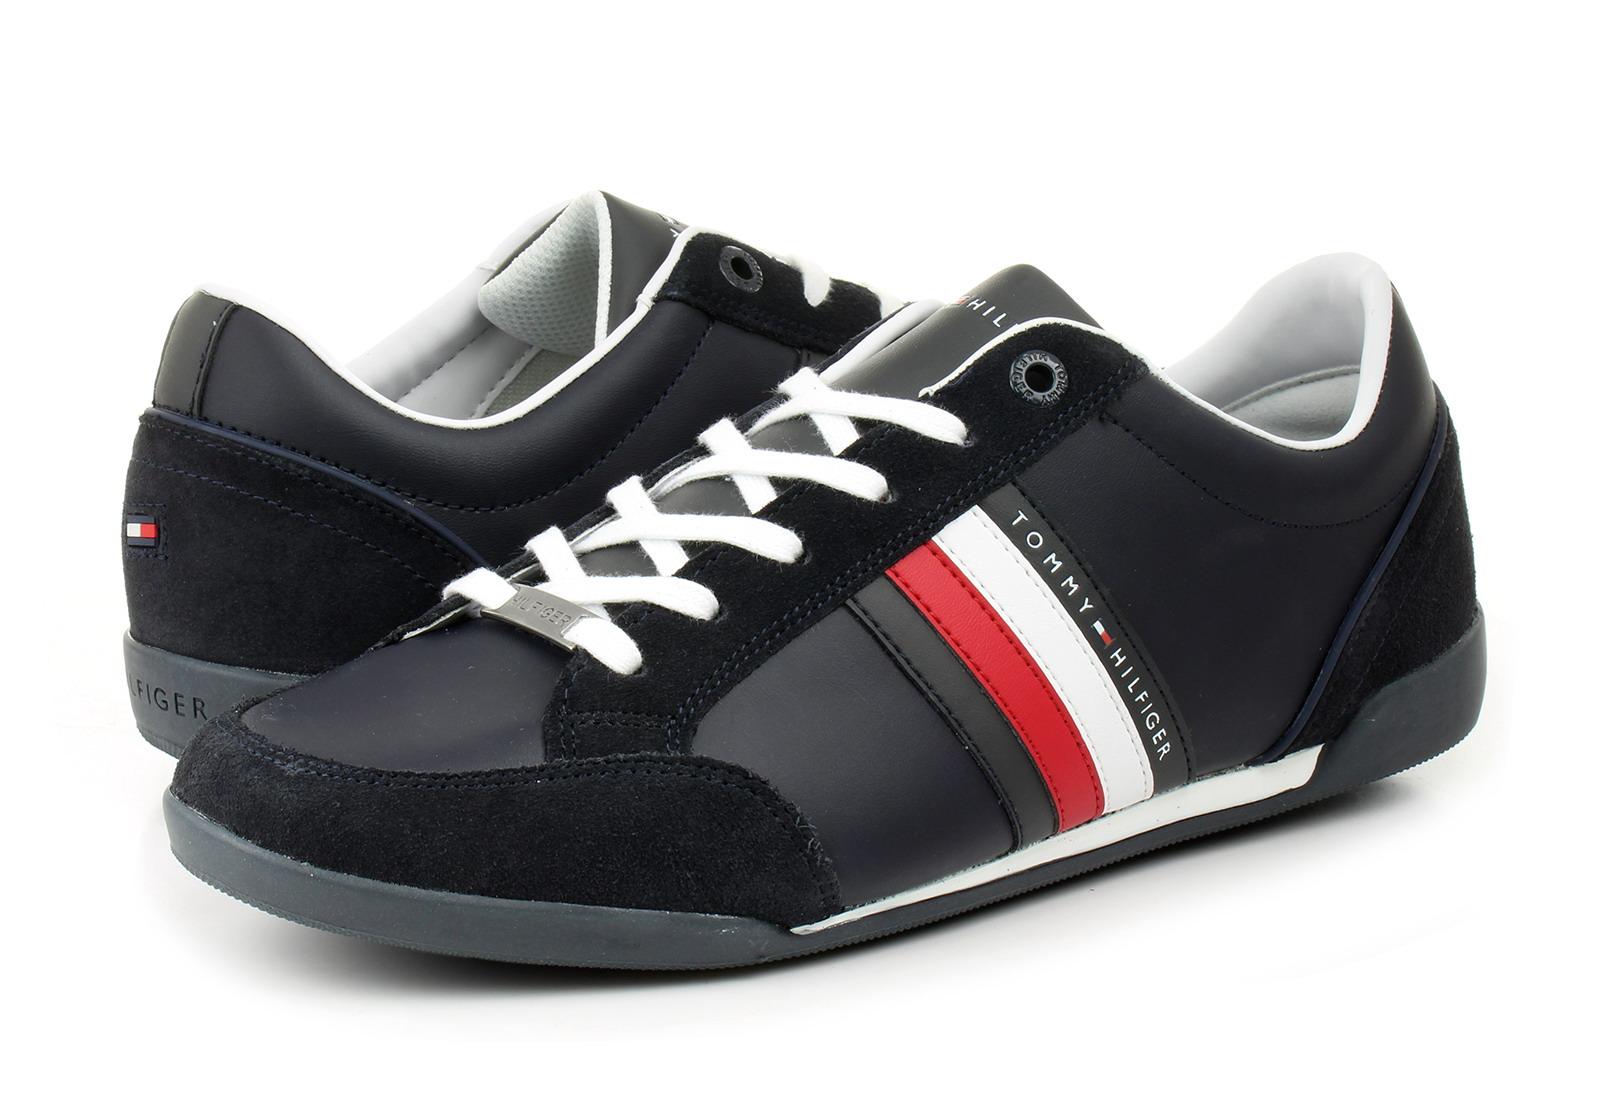 Tommy Hilfiger Shoes Royal 6c